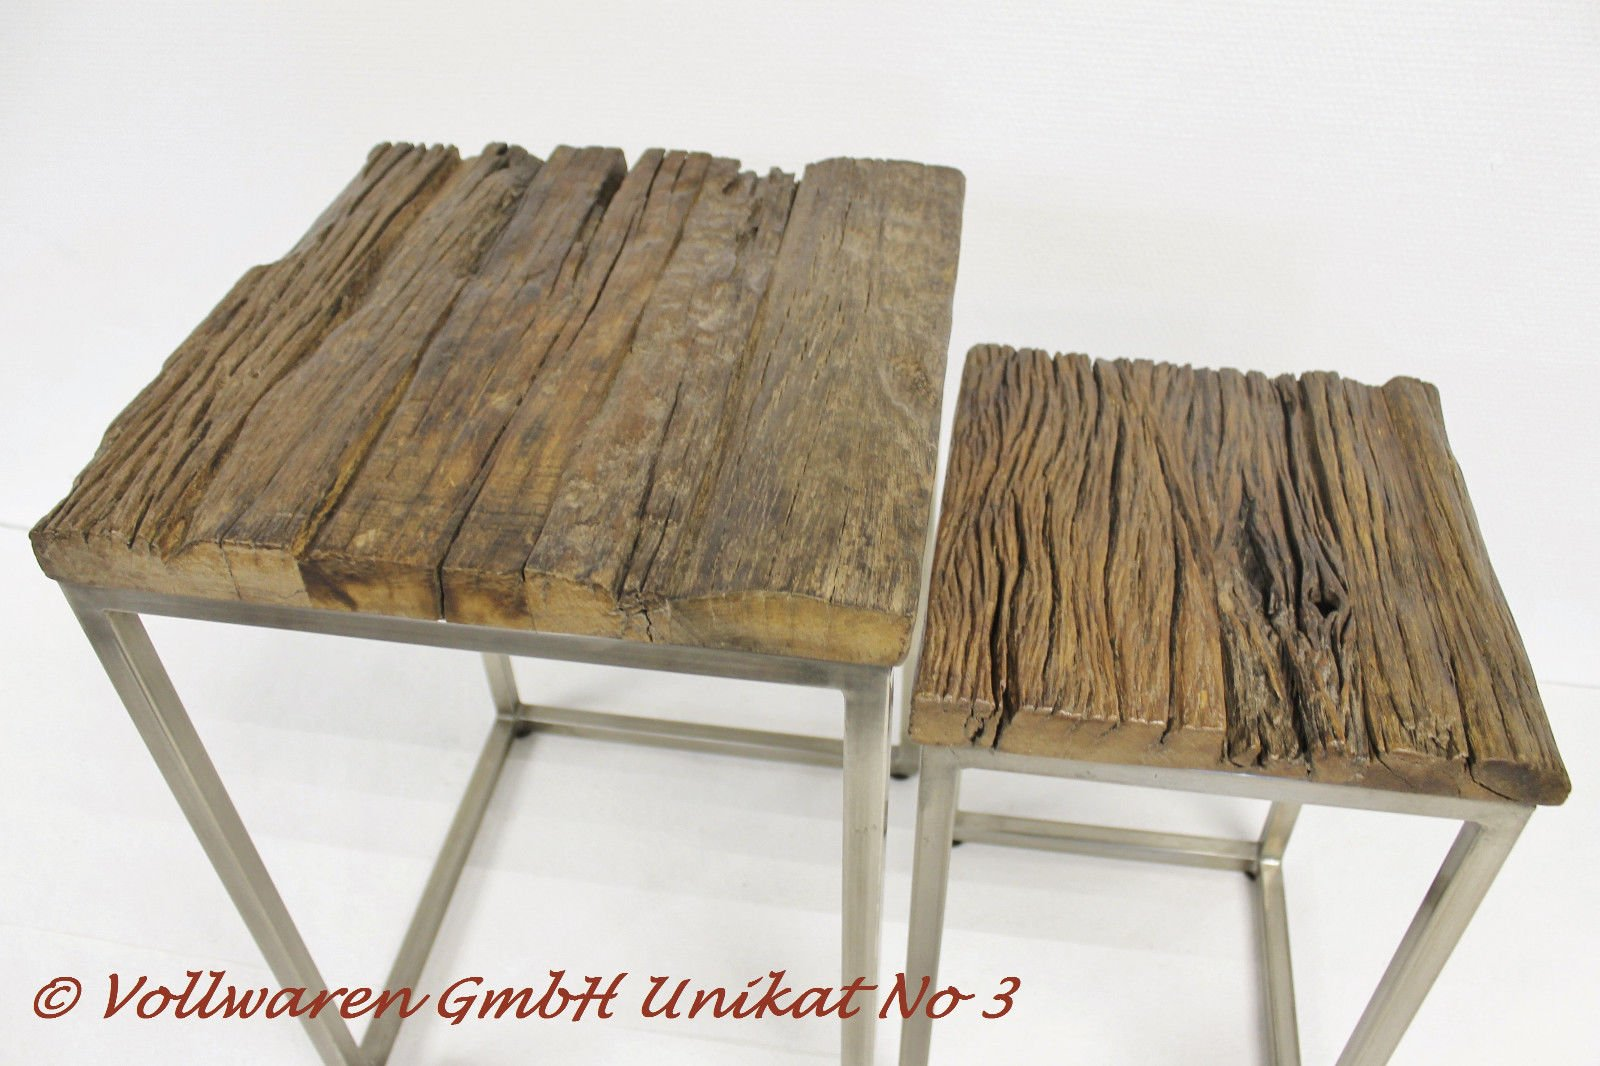 Teca Dos Juego de Mesa Madera de Teca Maciza Antiguo Juego de Mesa Mesa Auxiliar (, Unikat No3, 60 x 40 x 40 cm/50 x 30 x 30 cm: Amazon.es: Hogar